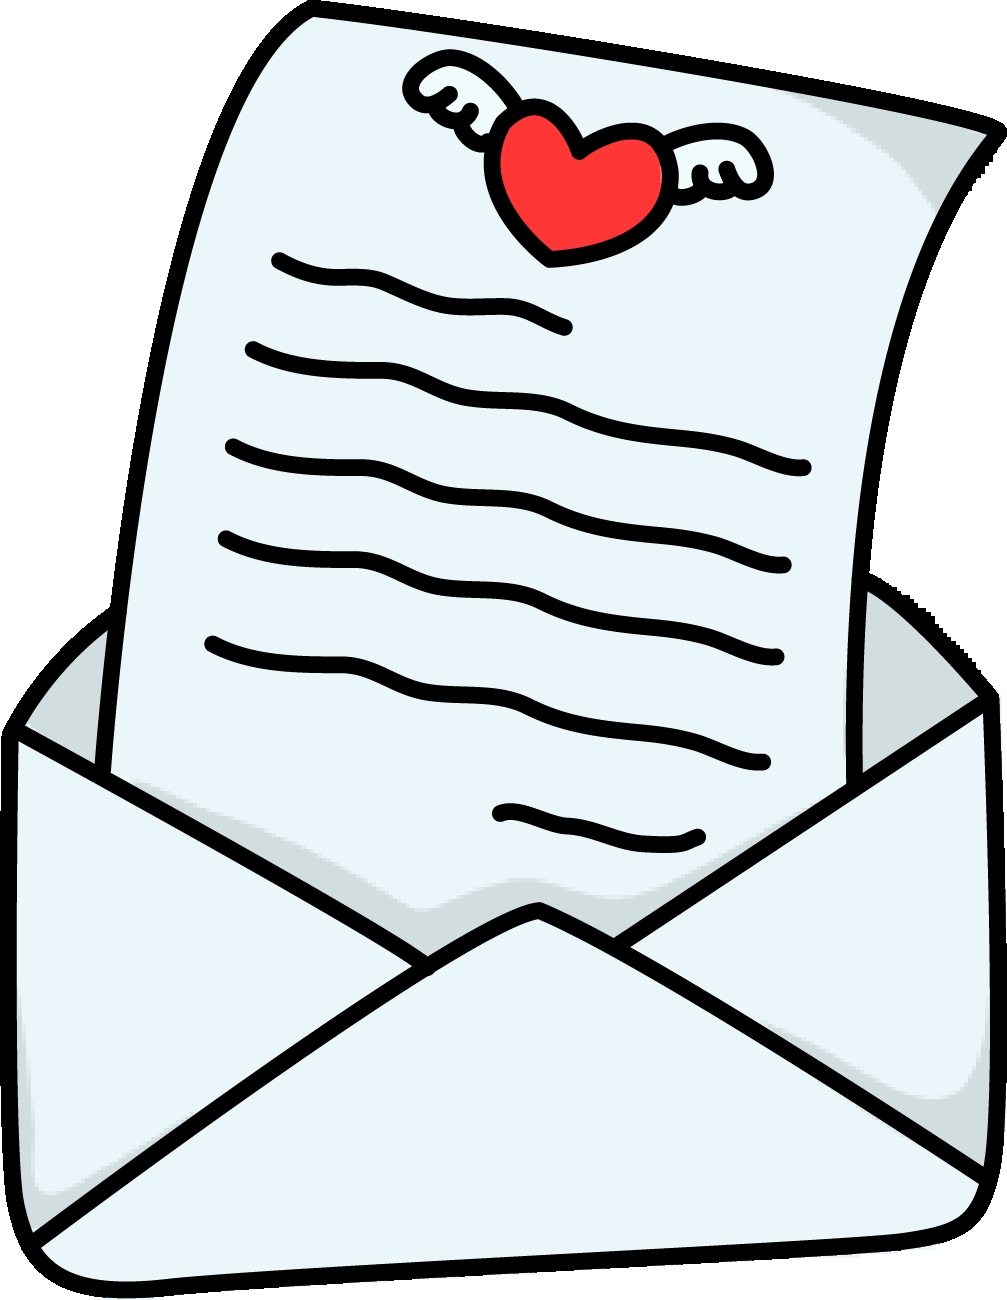 1007x1300 Best Of Letter Clipart Design